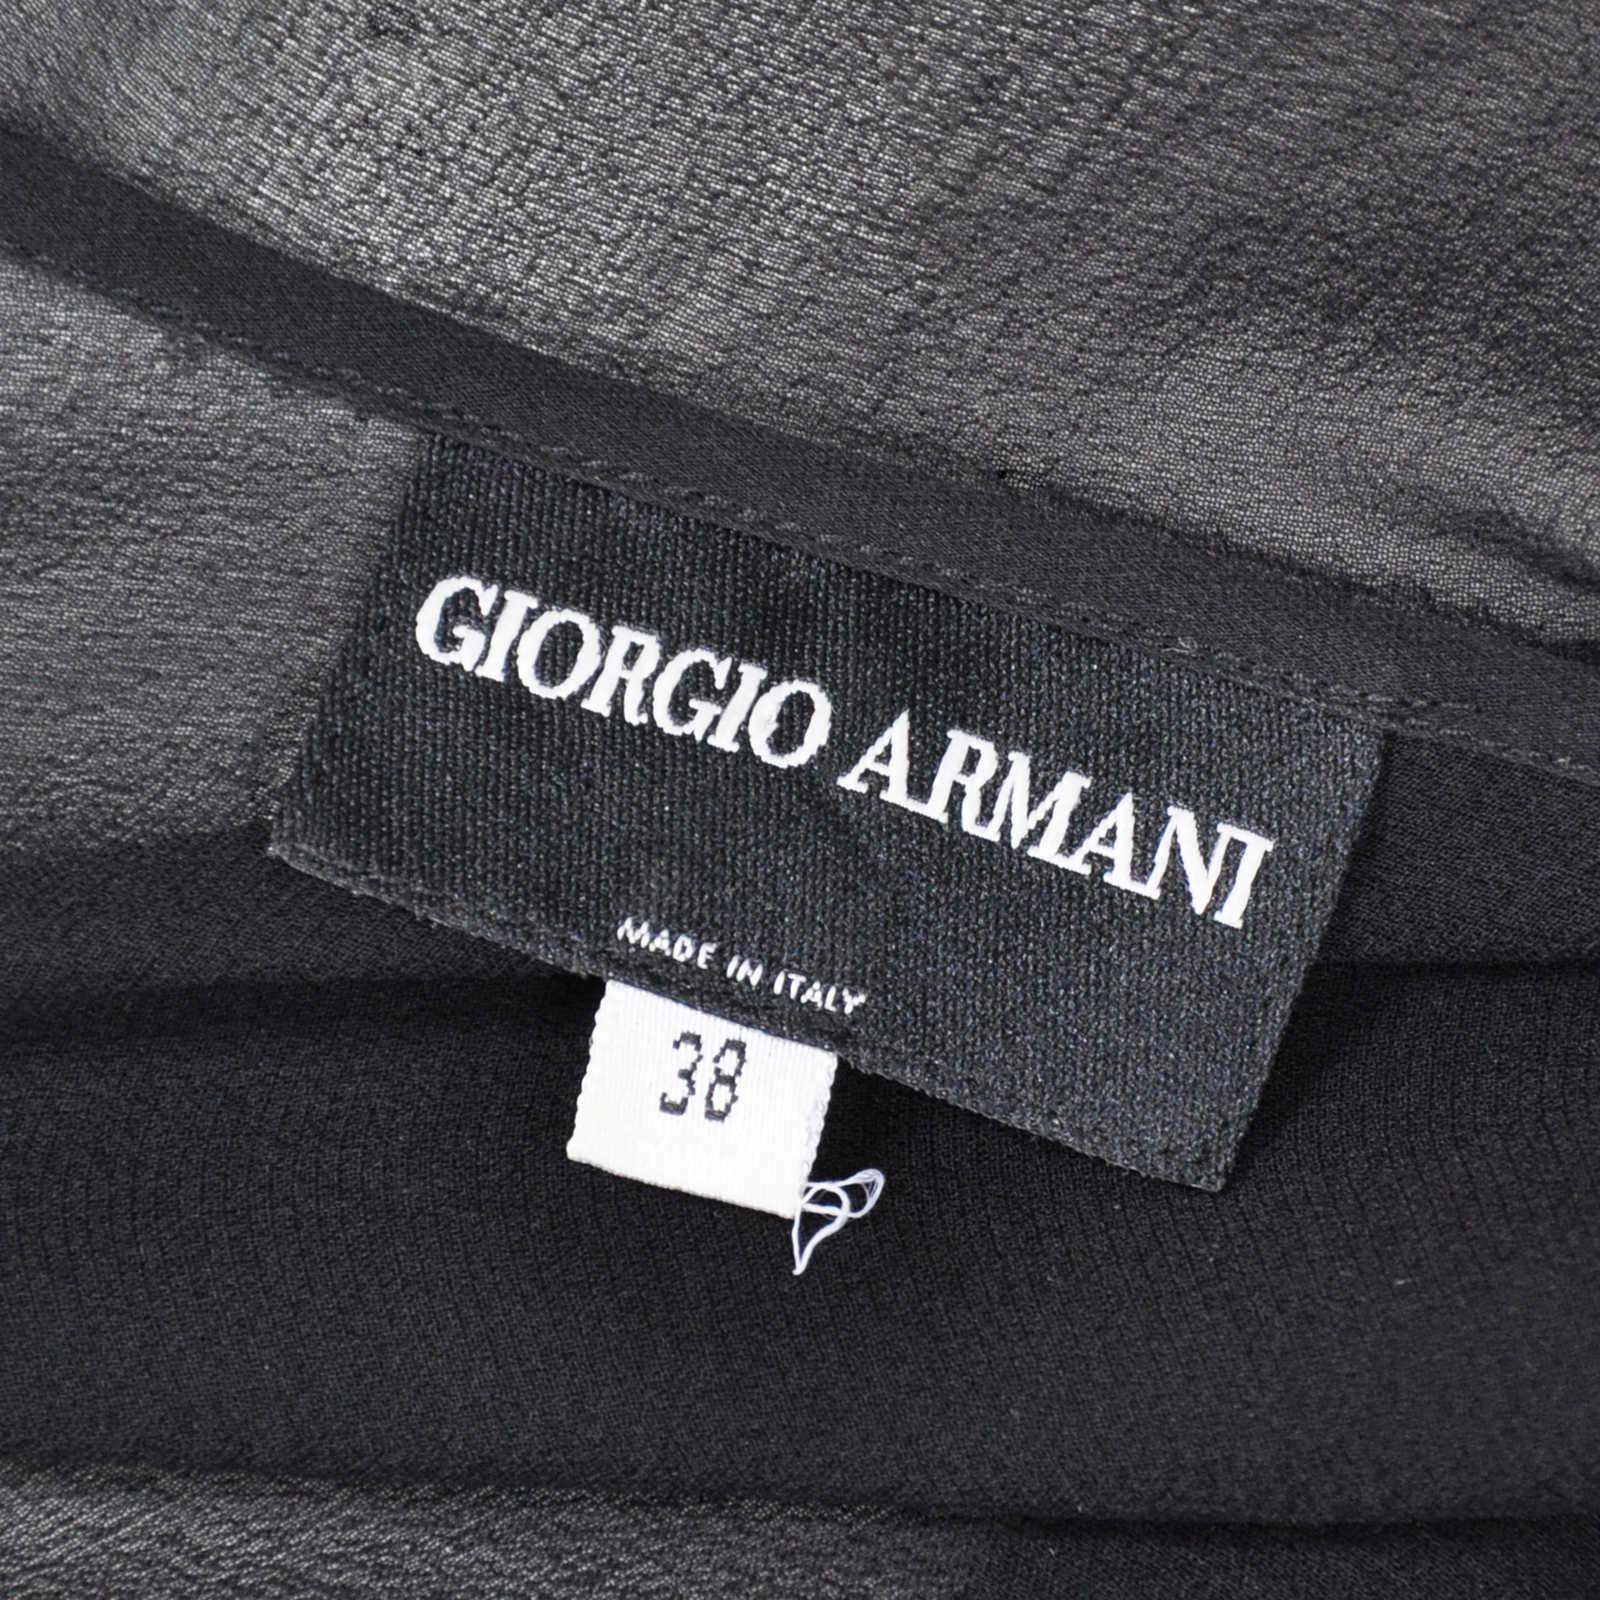 8c14e000023 ... Authentic Second Hand Giorgio Armani Sheer Capelet Top (PSS-067-00072) -